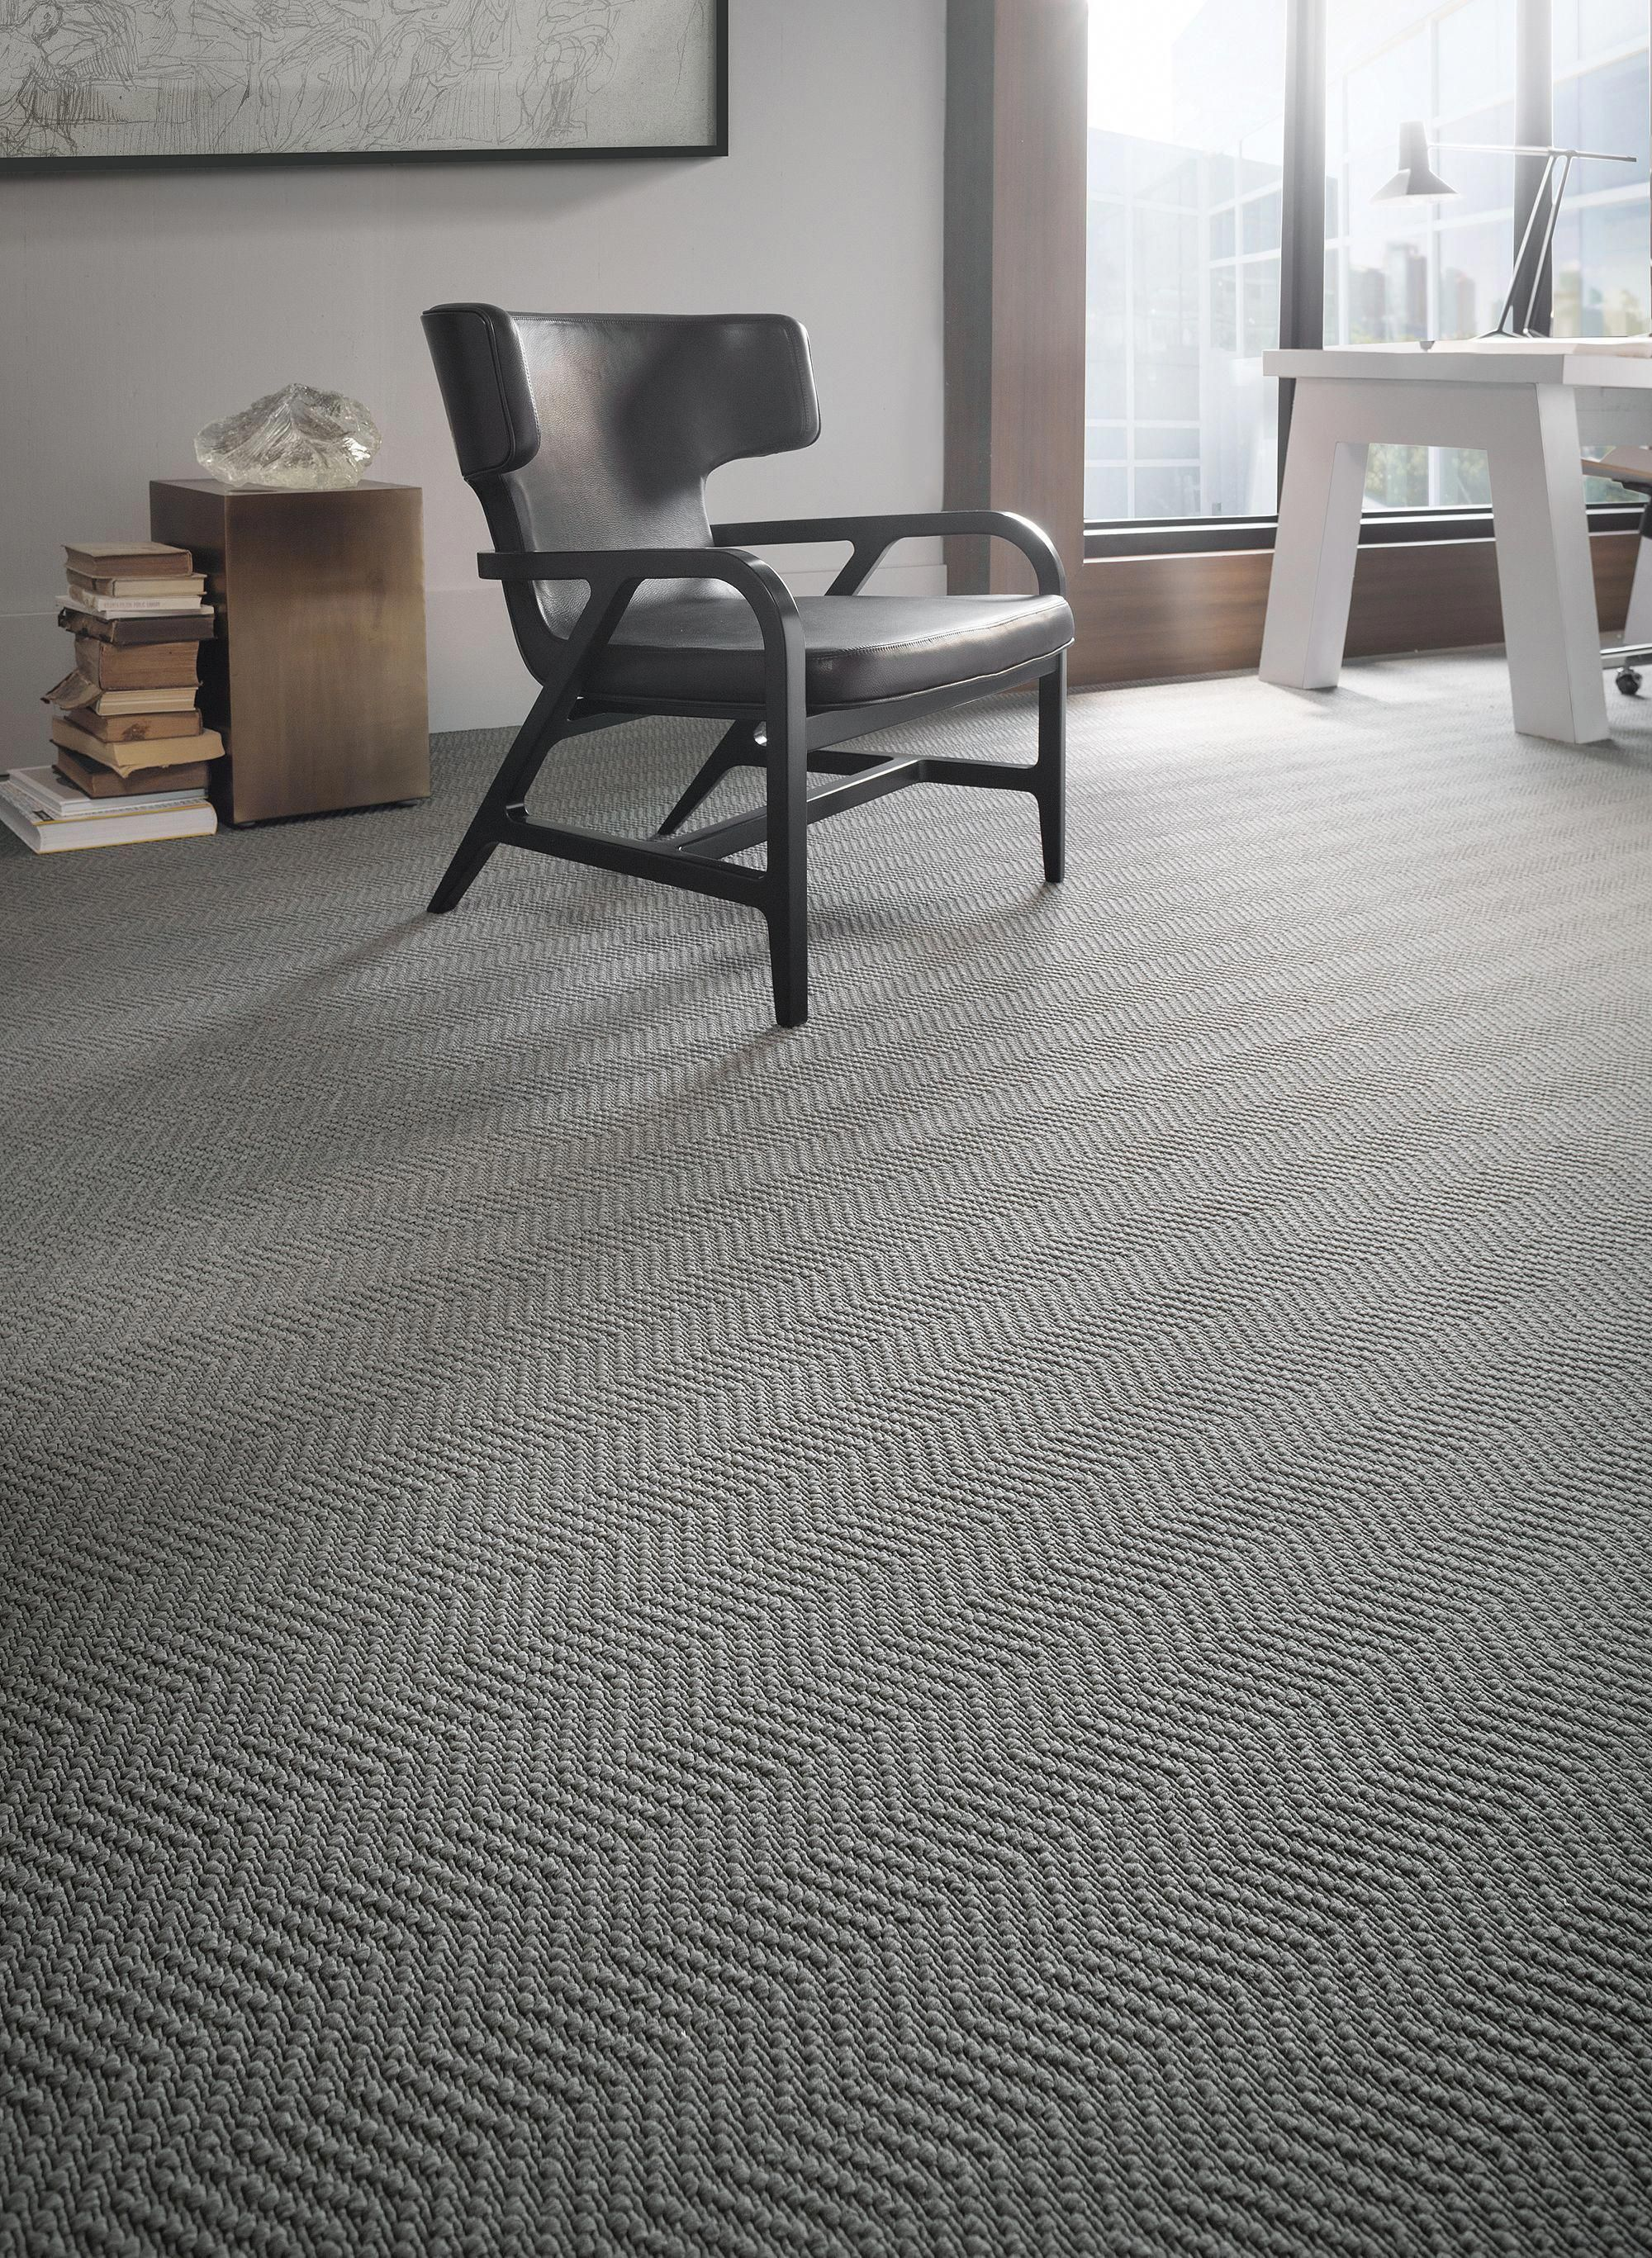 Carpet Runner Installation Guide Hallcarpetrunnerscheap Post 1422311598 Buying Carpet Stair Runner Carpet Carpet Tiles